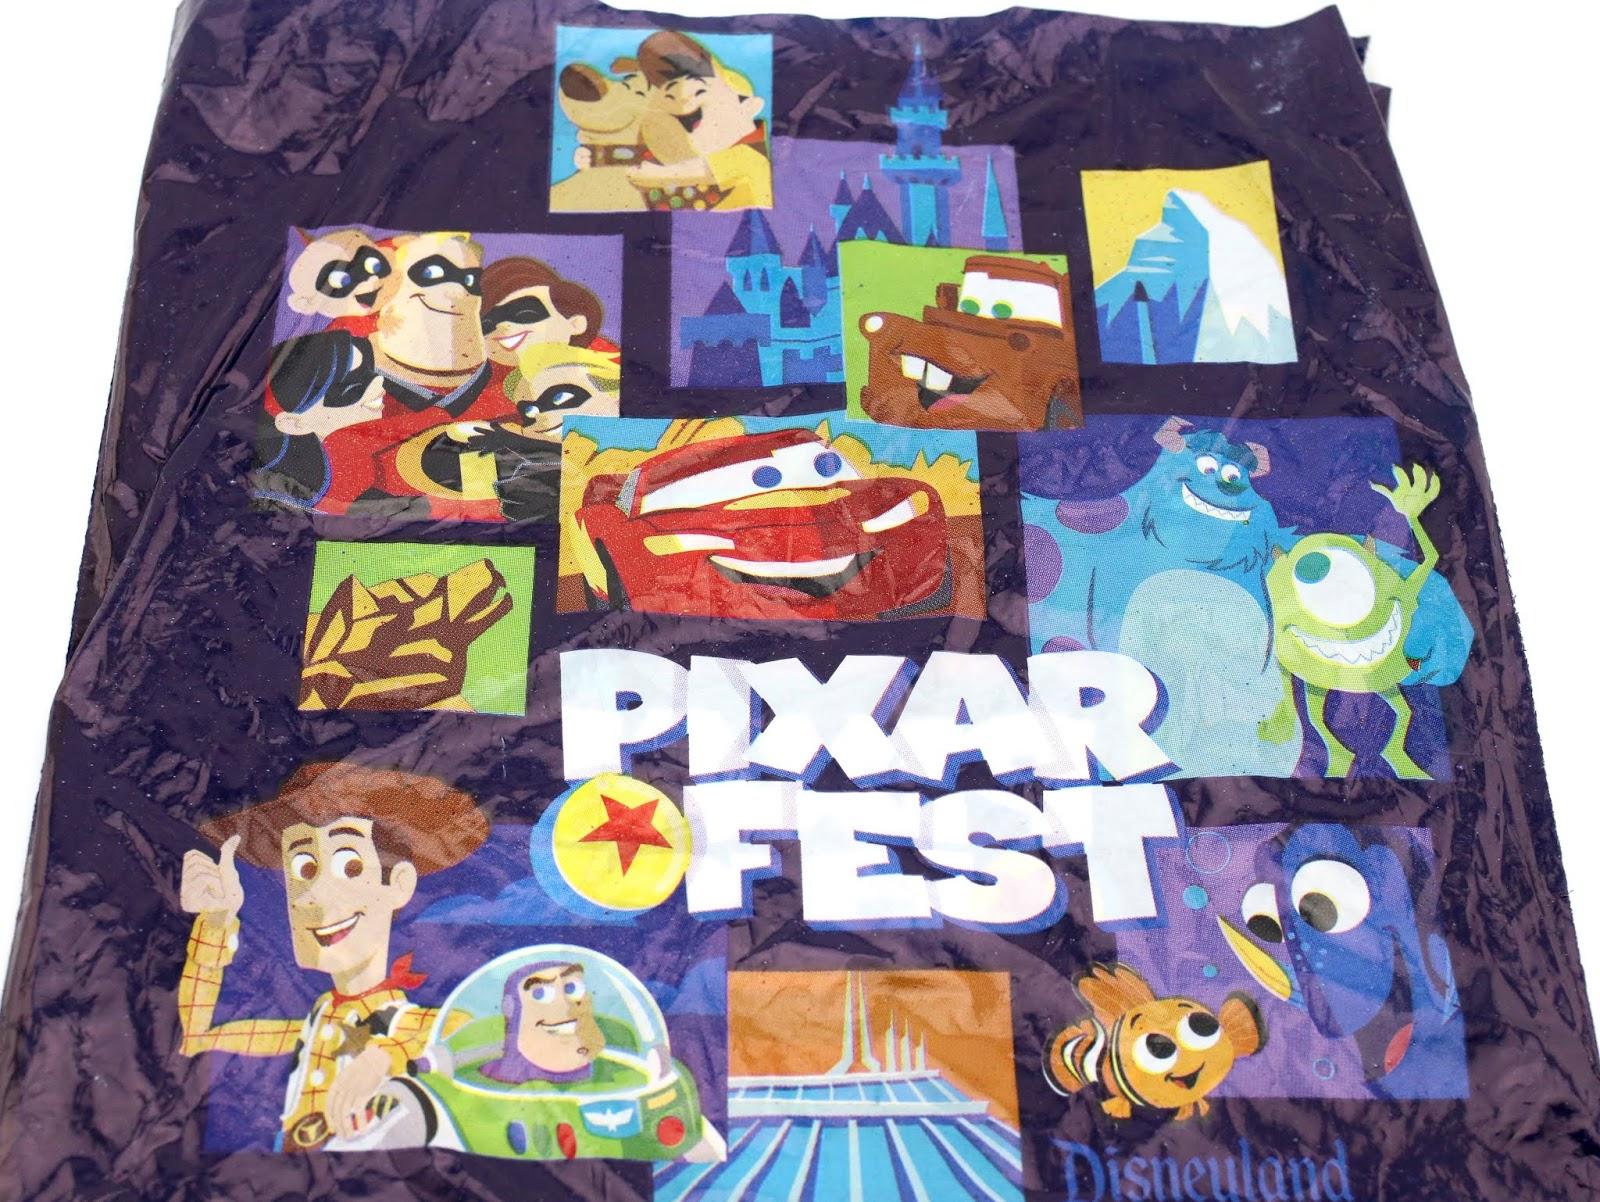 pixar fest 2018 park bag